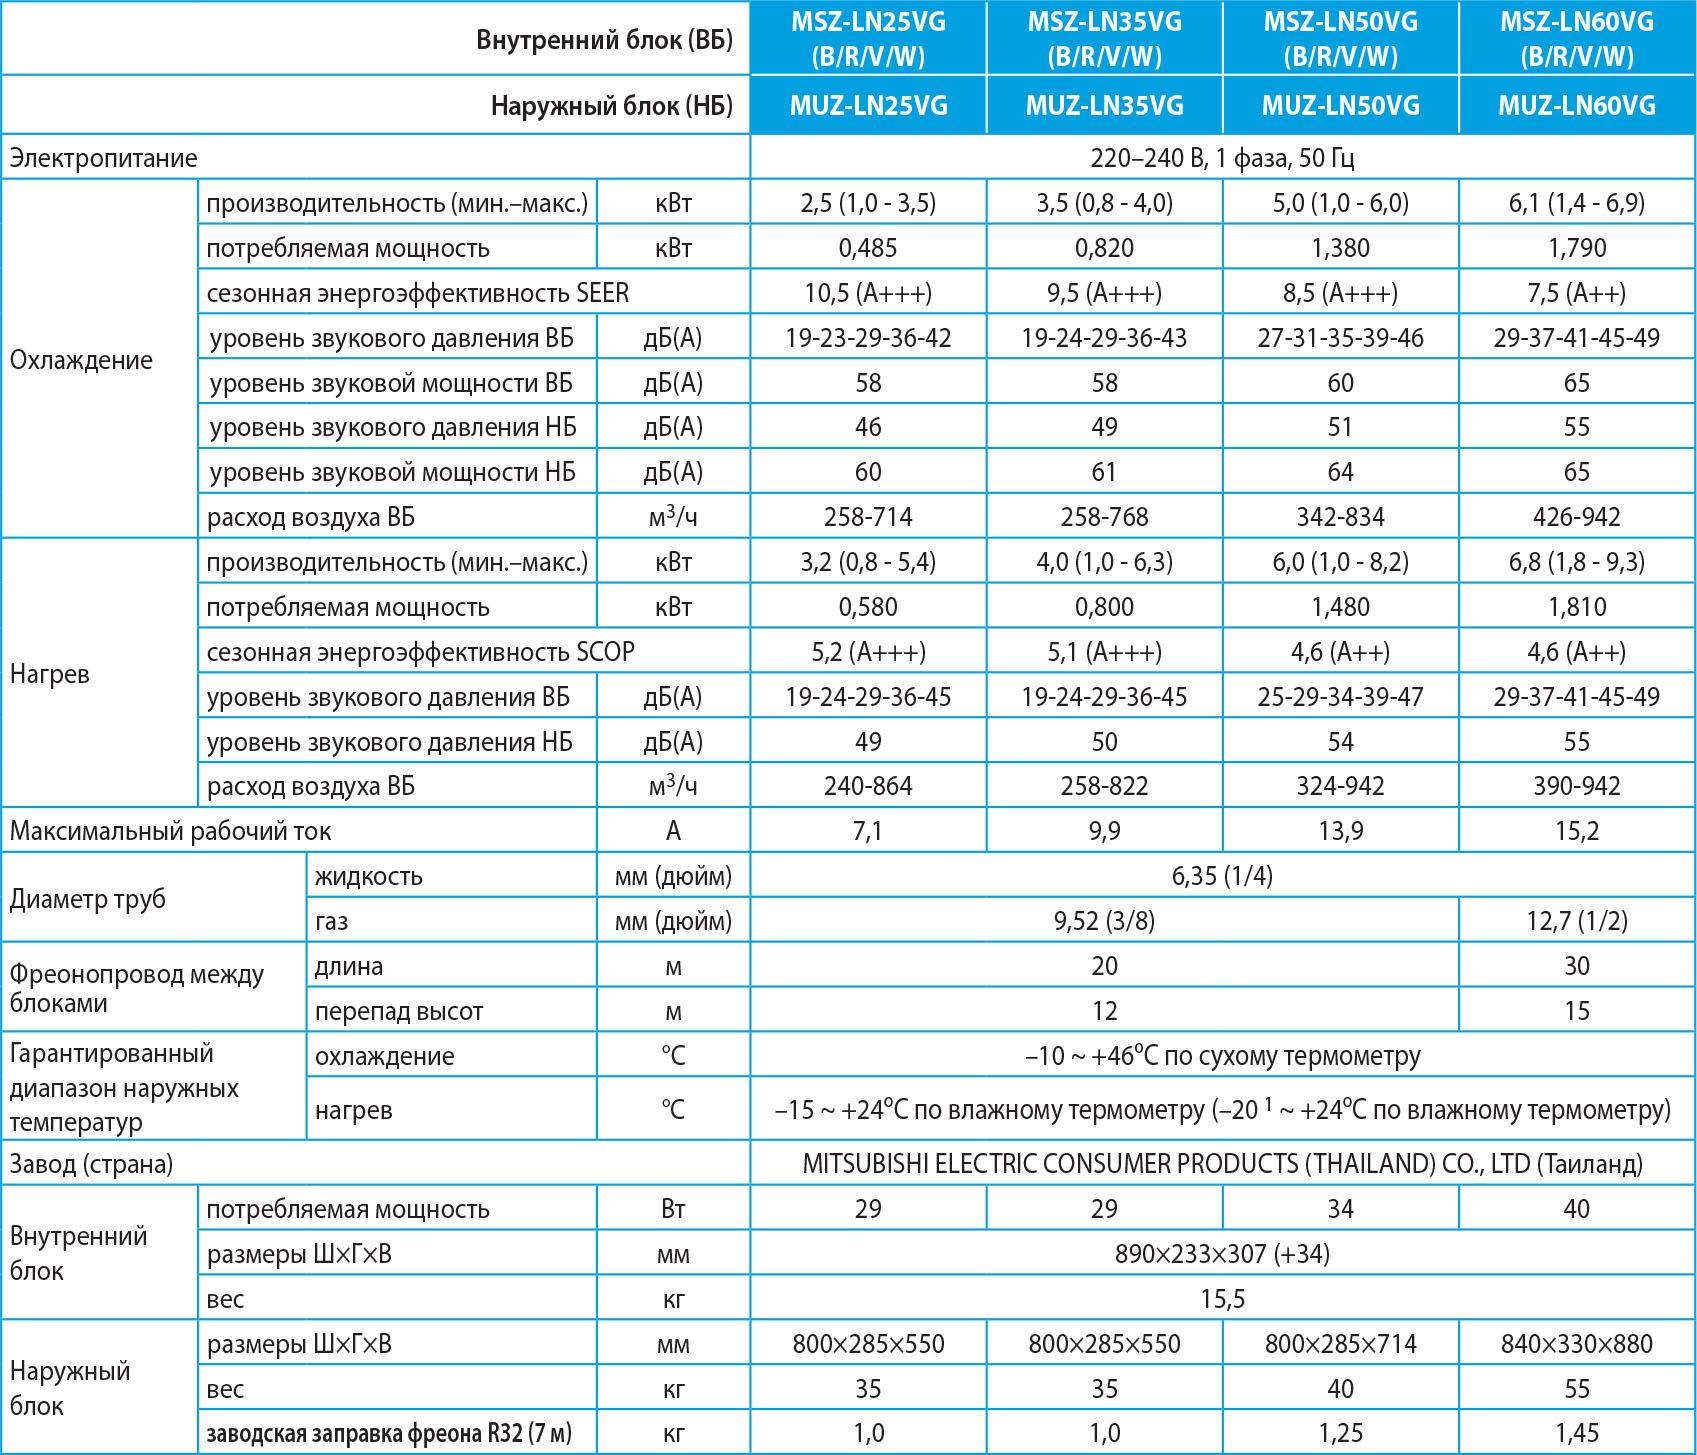 Технические характеристики кондиционера Mitsubishi Electric MSZ-LN35VGB-E1 / MUZ-LN35VG-E1 серии Premium Inverter